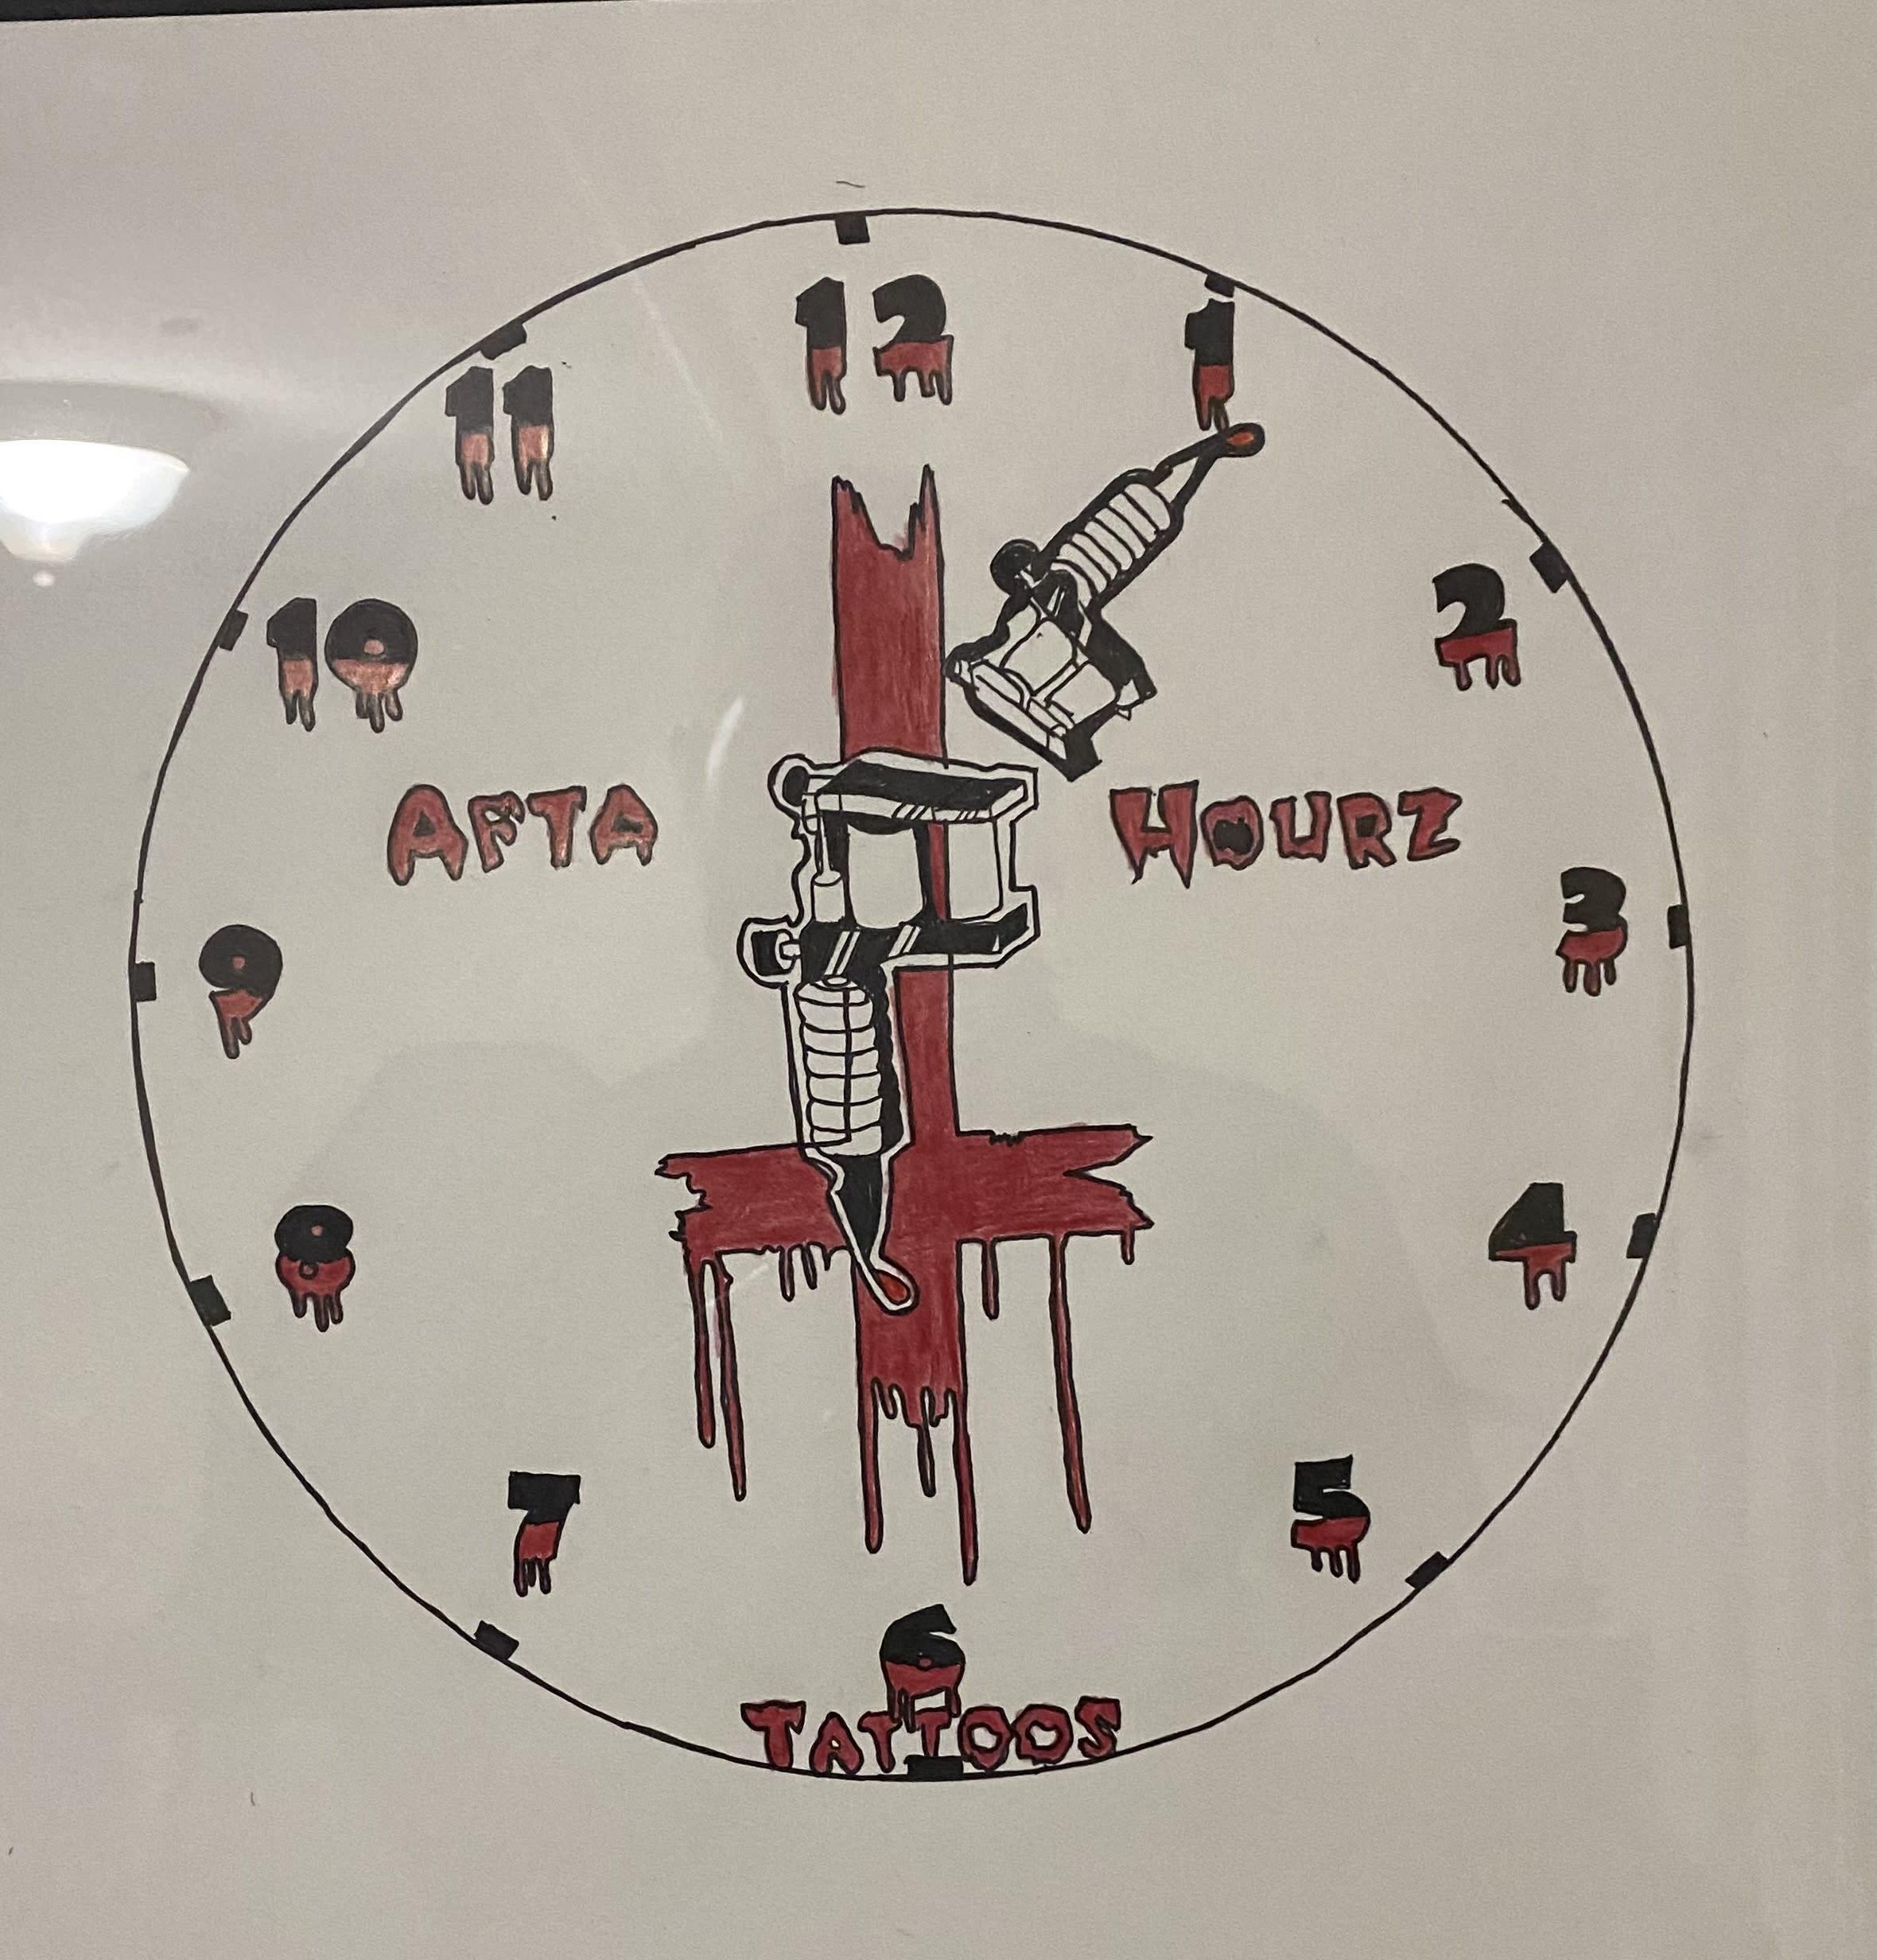 Afta Hourz Tattoos